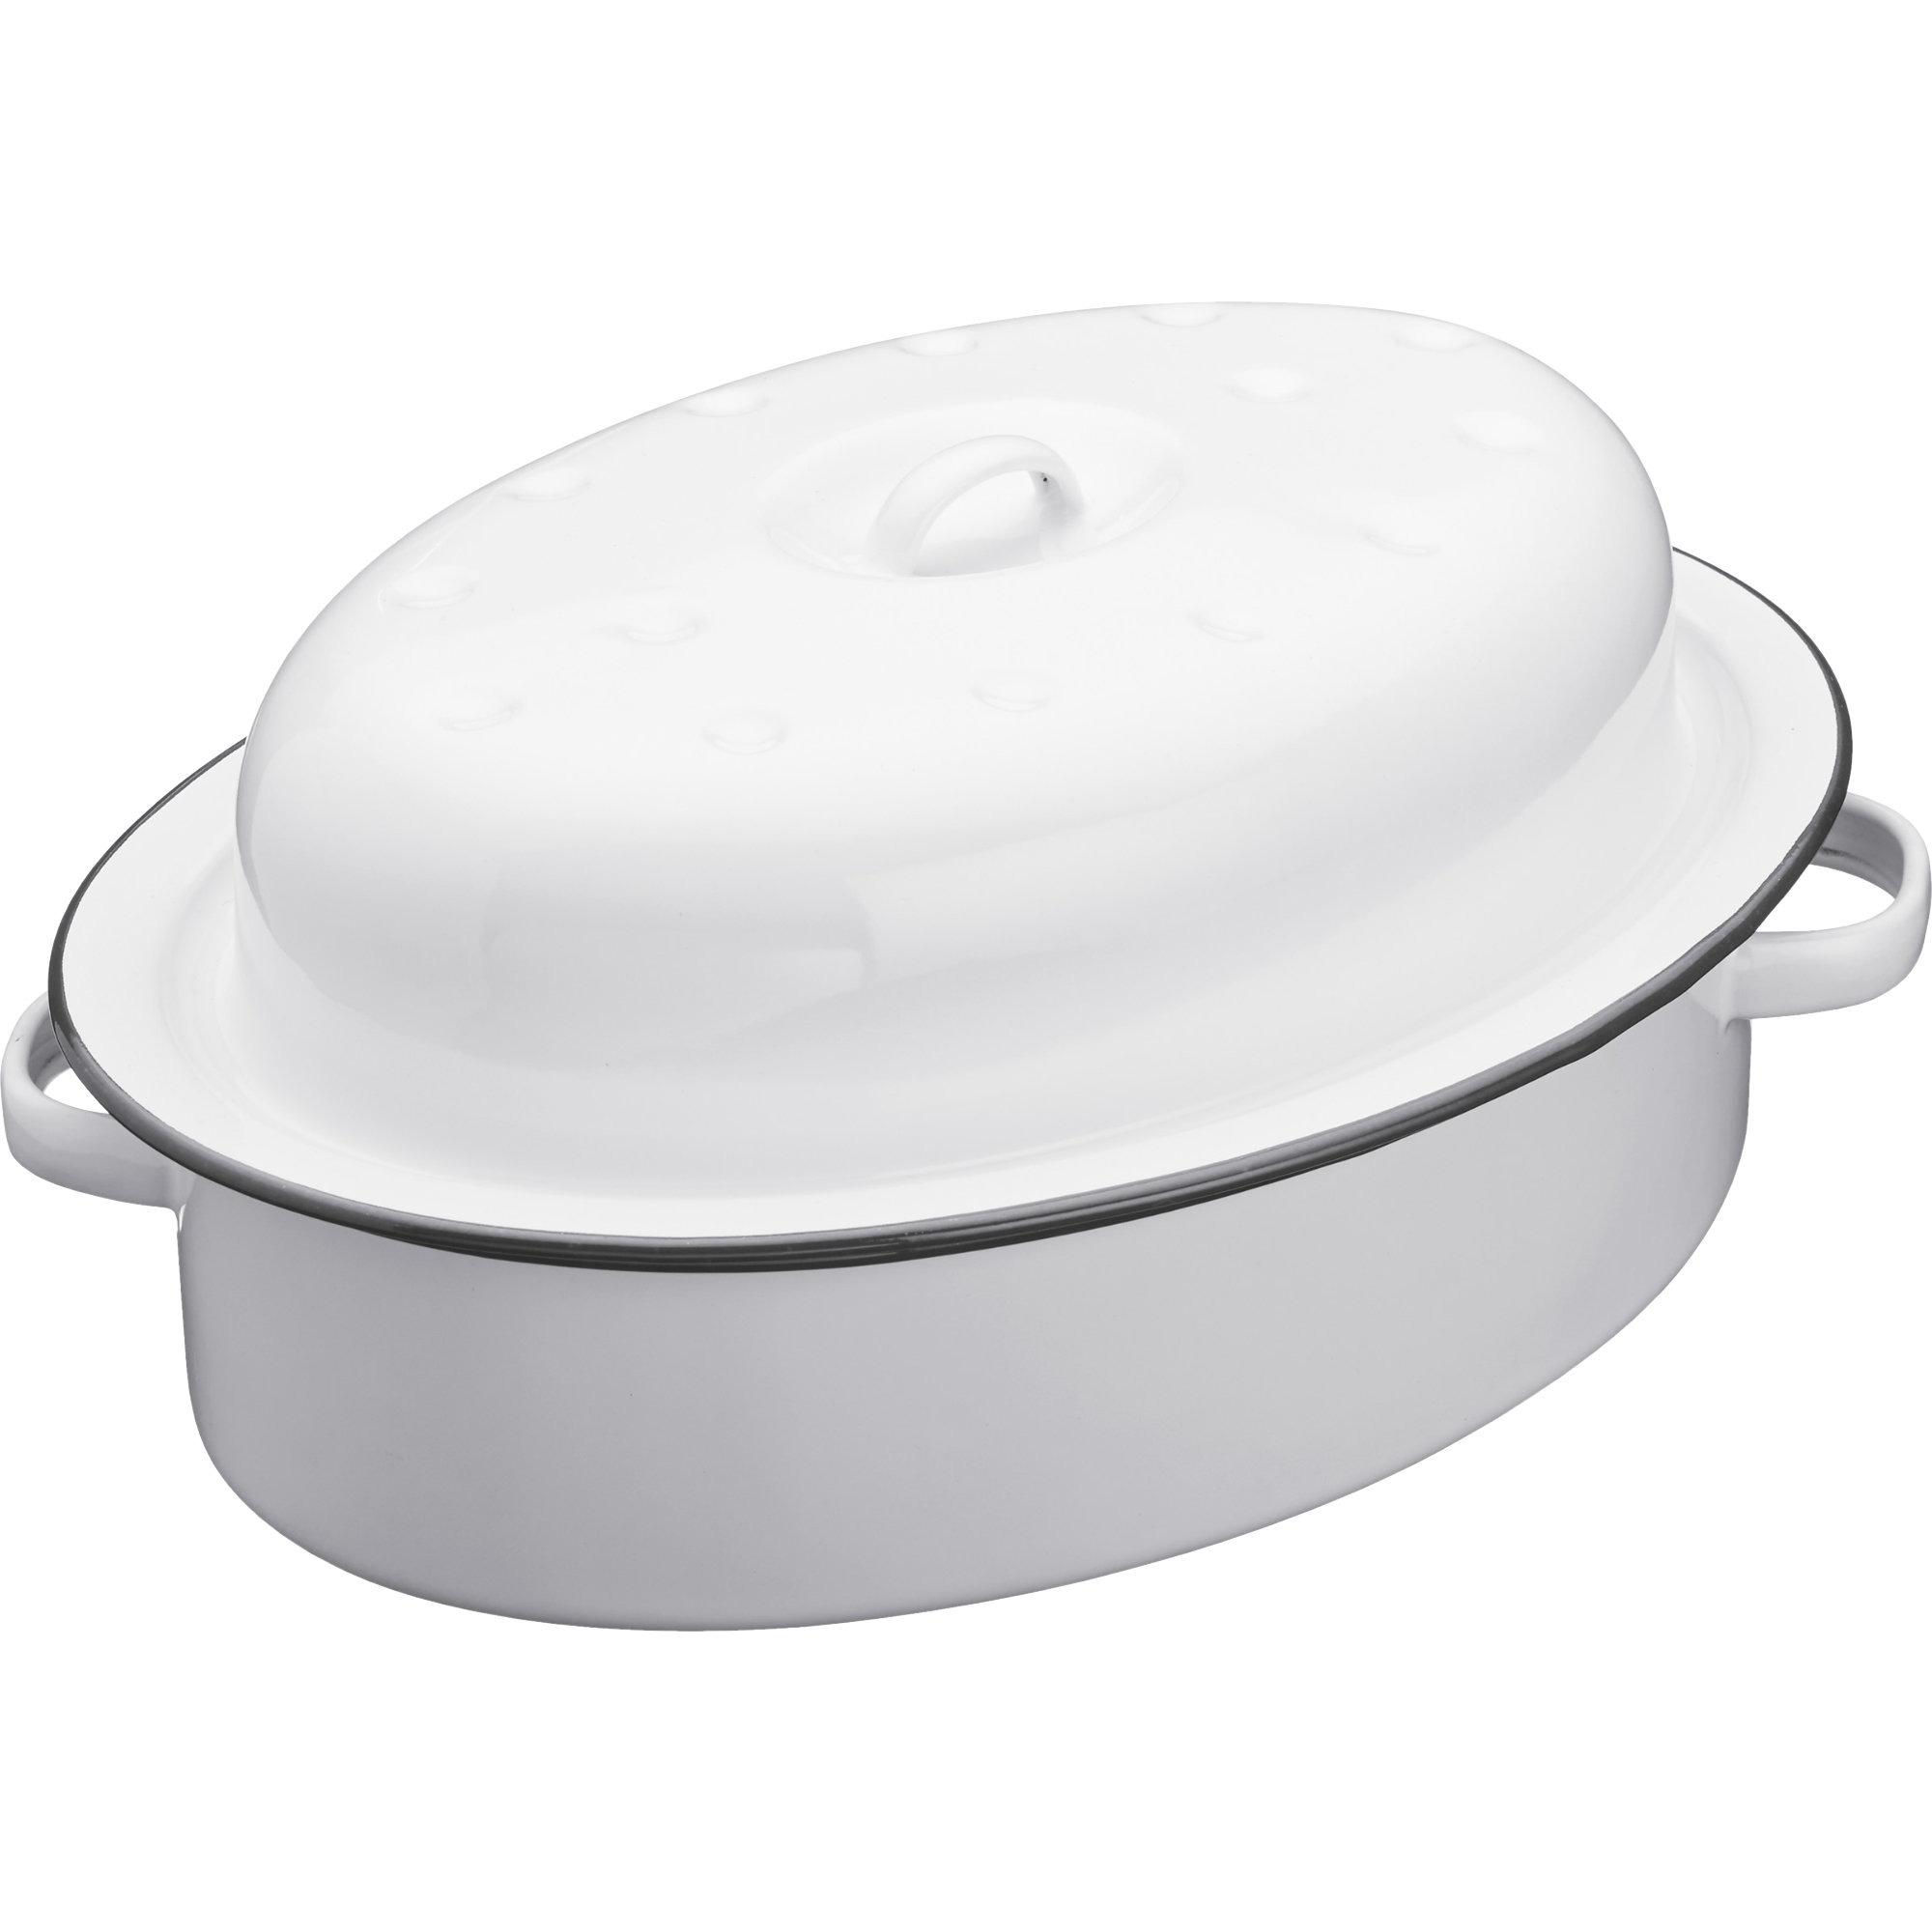 Kitchen Craft Emaljgryta Oval med lock - Vit/grå 30cm